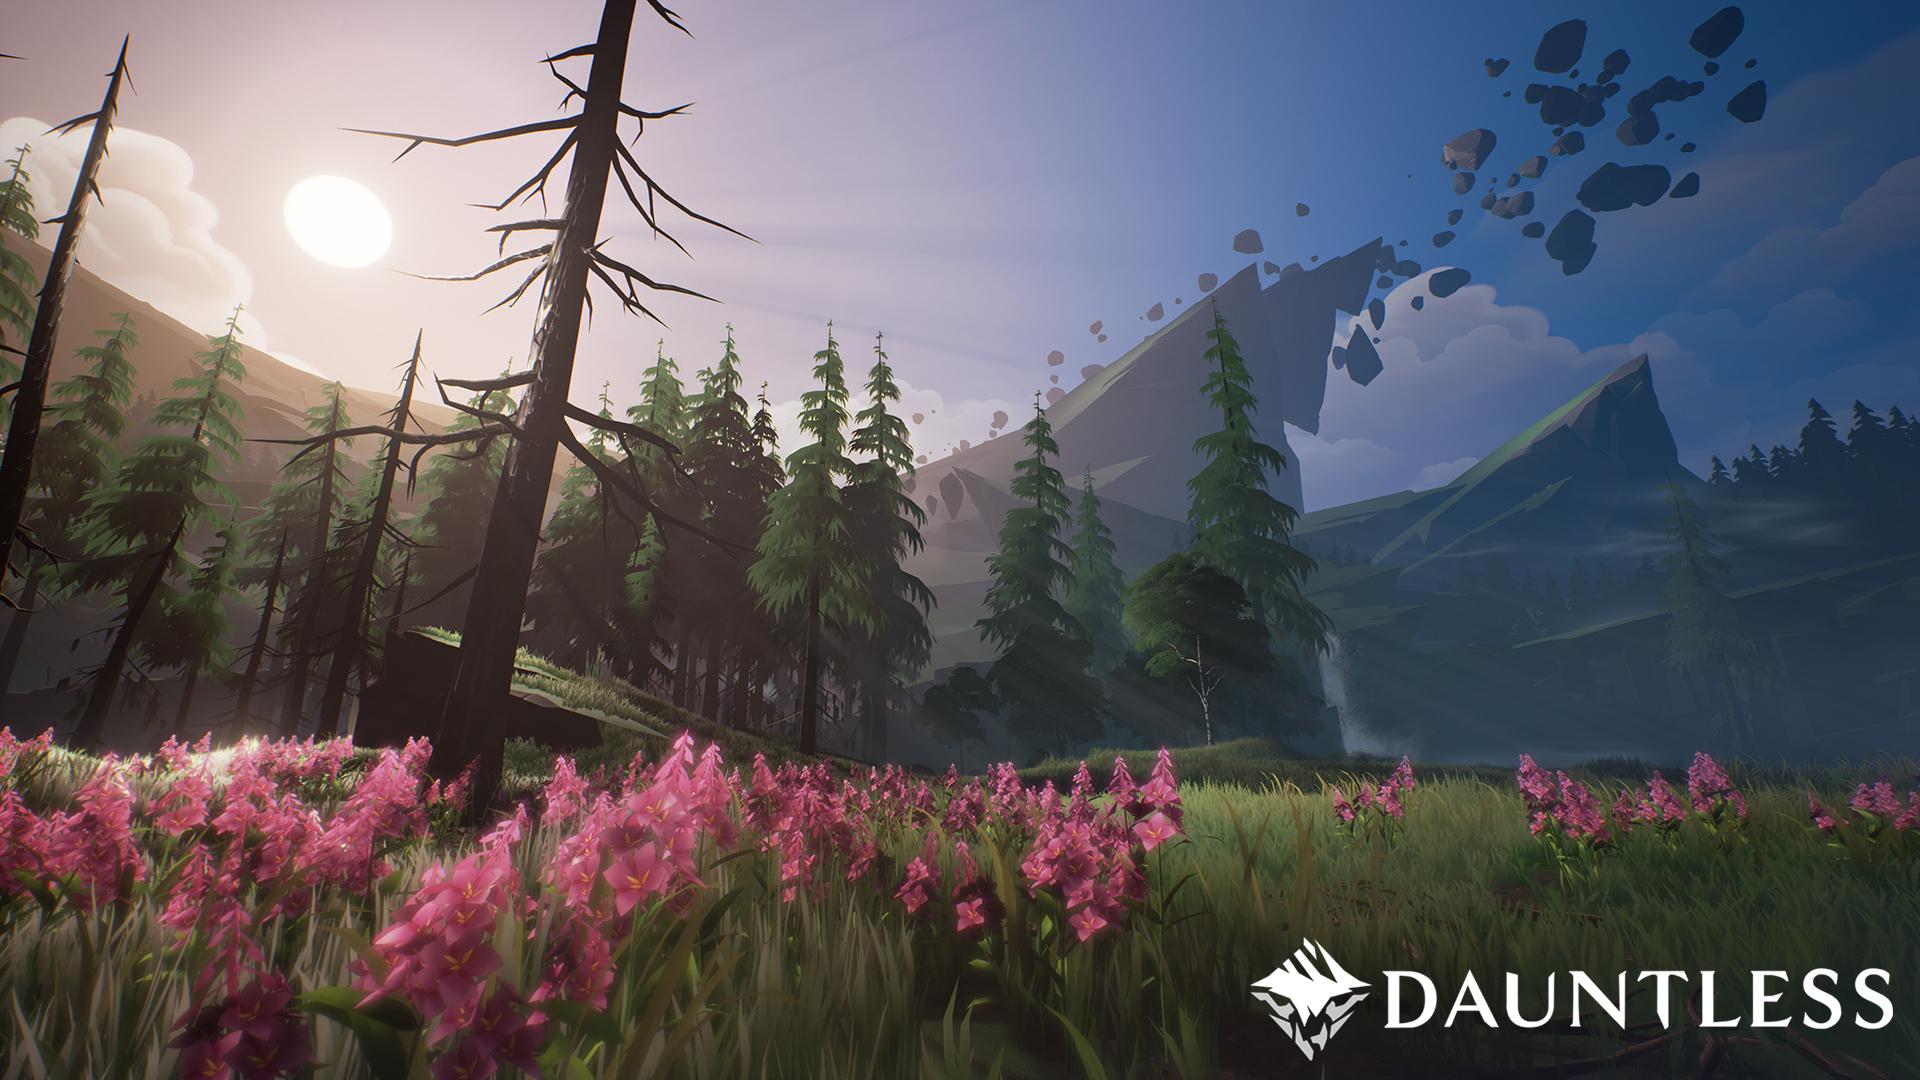 spring-day-island-screenshots-dauntless.jpg